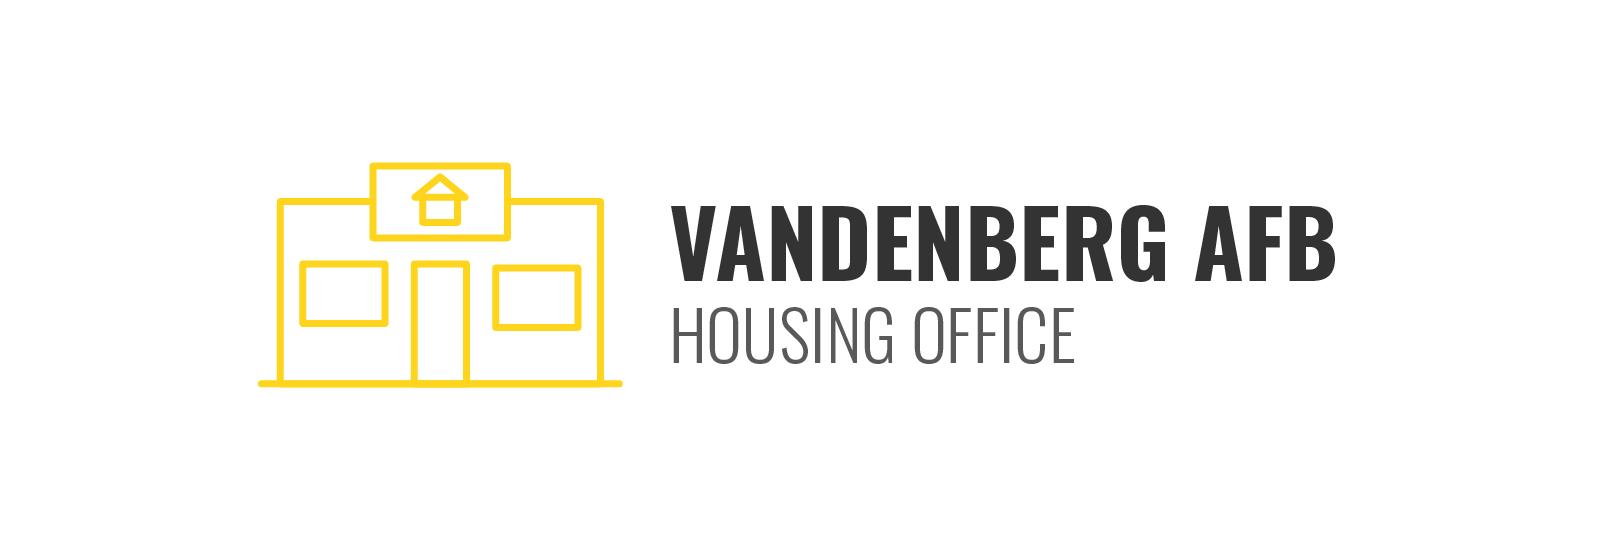 Vandenberg AFB Housing Office